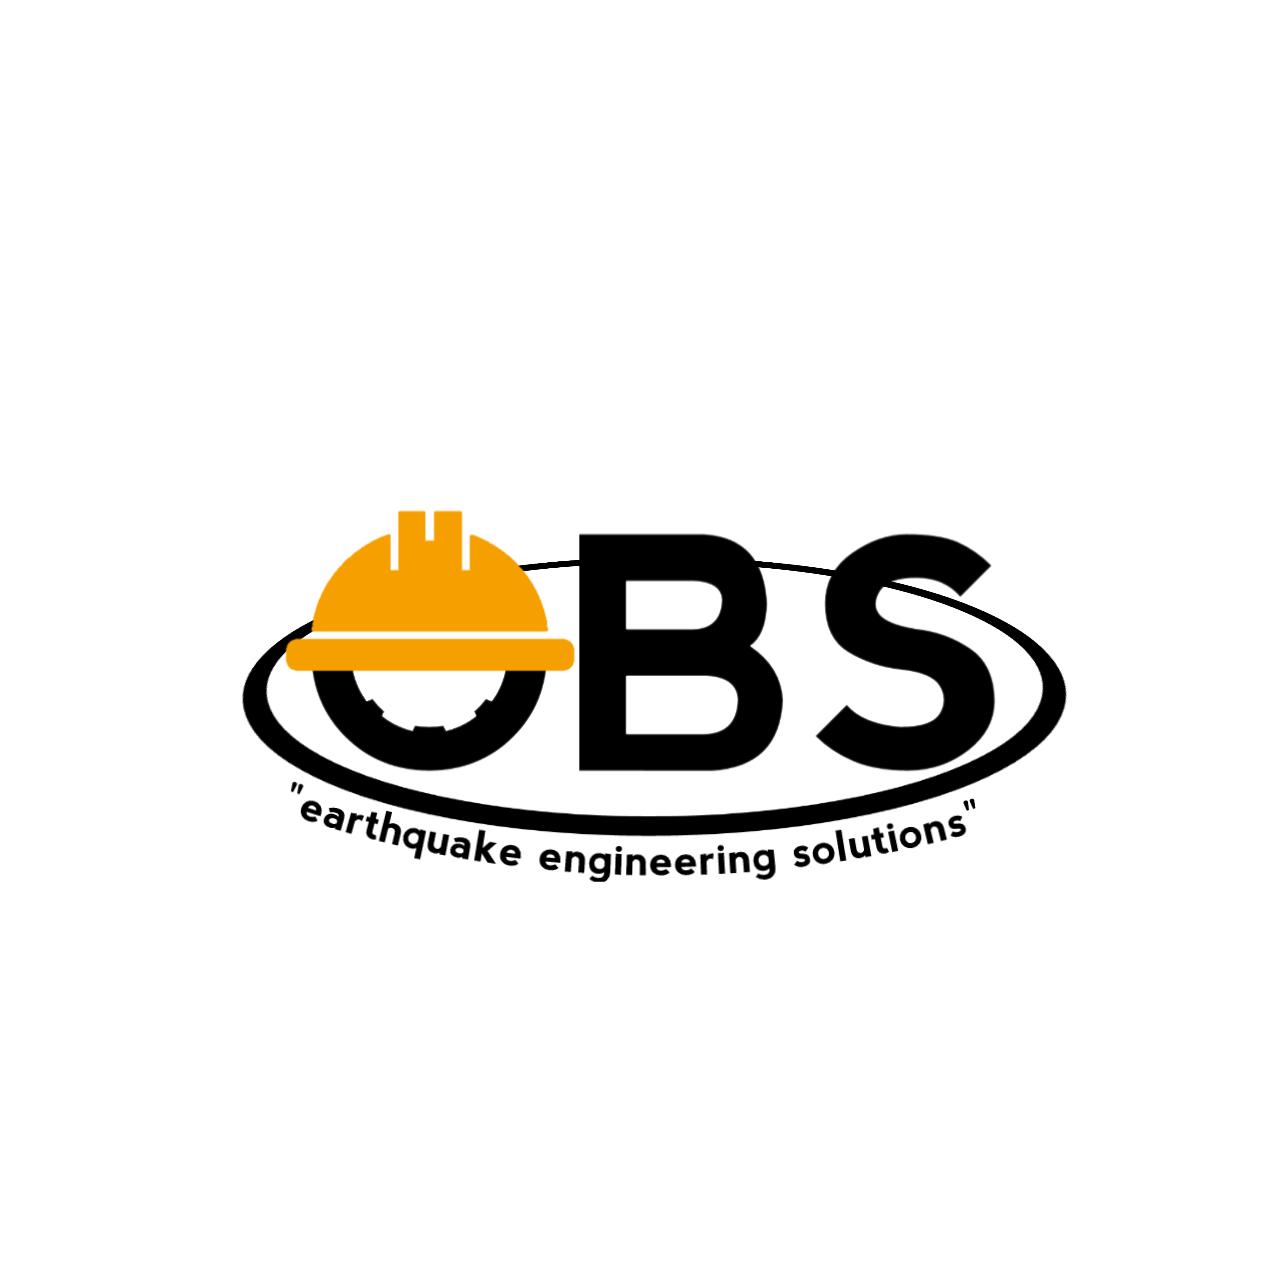 Serio Profesional Civil Engineer Diseno De Logo For Obs